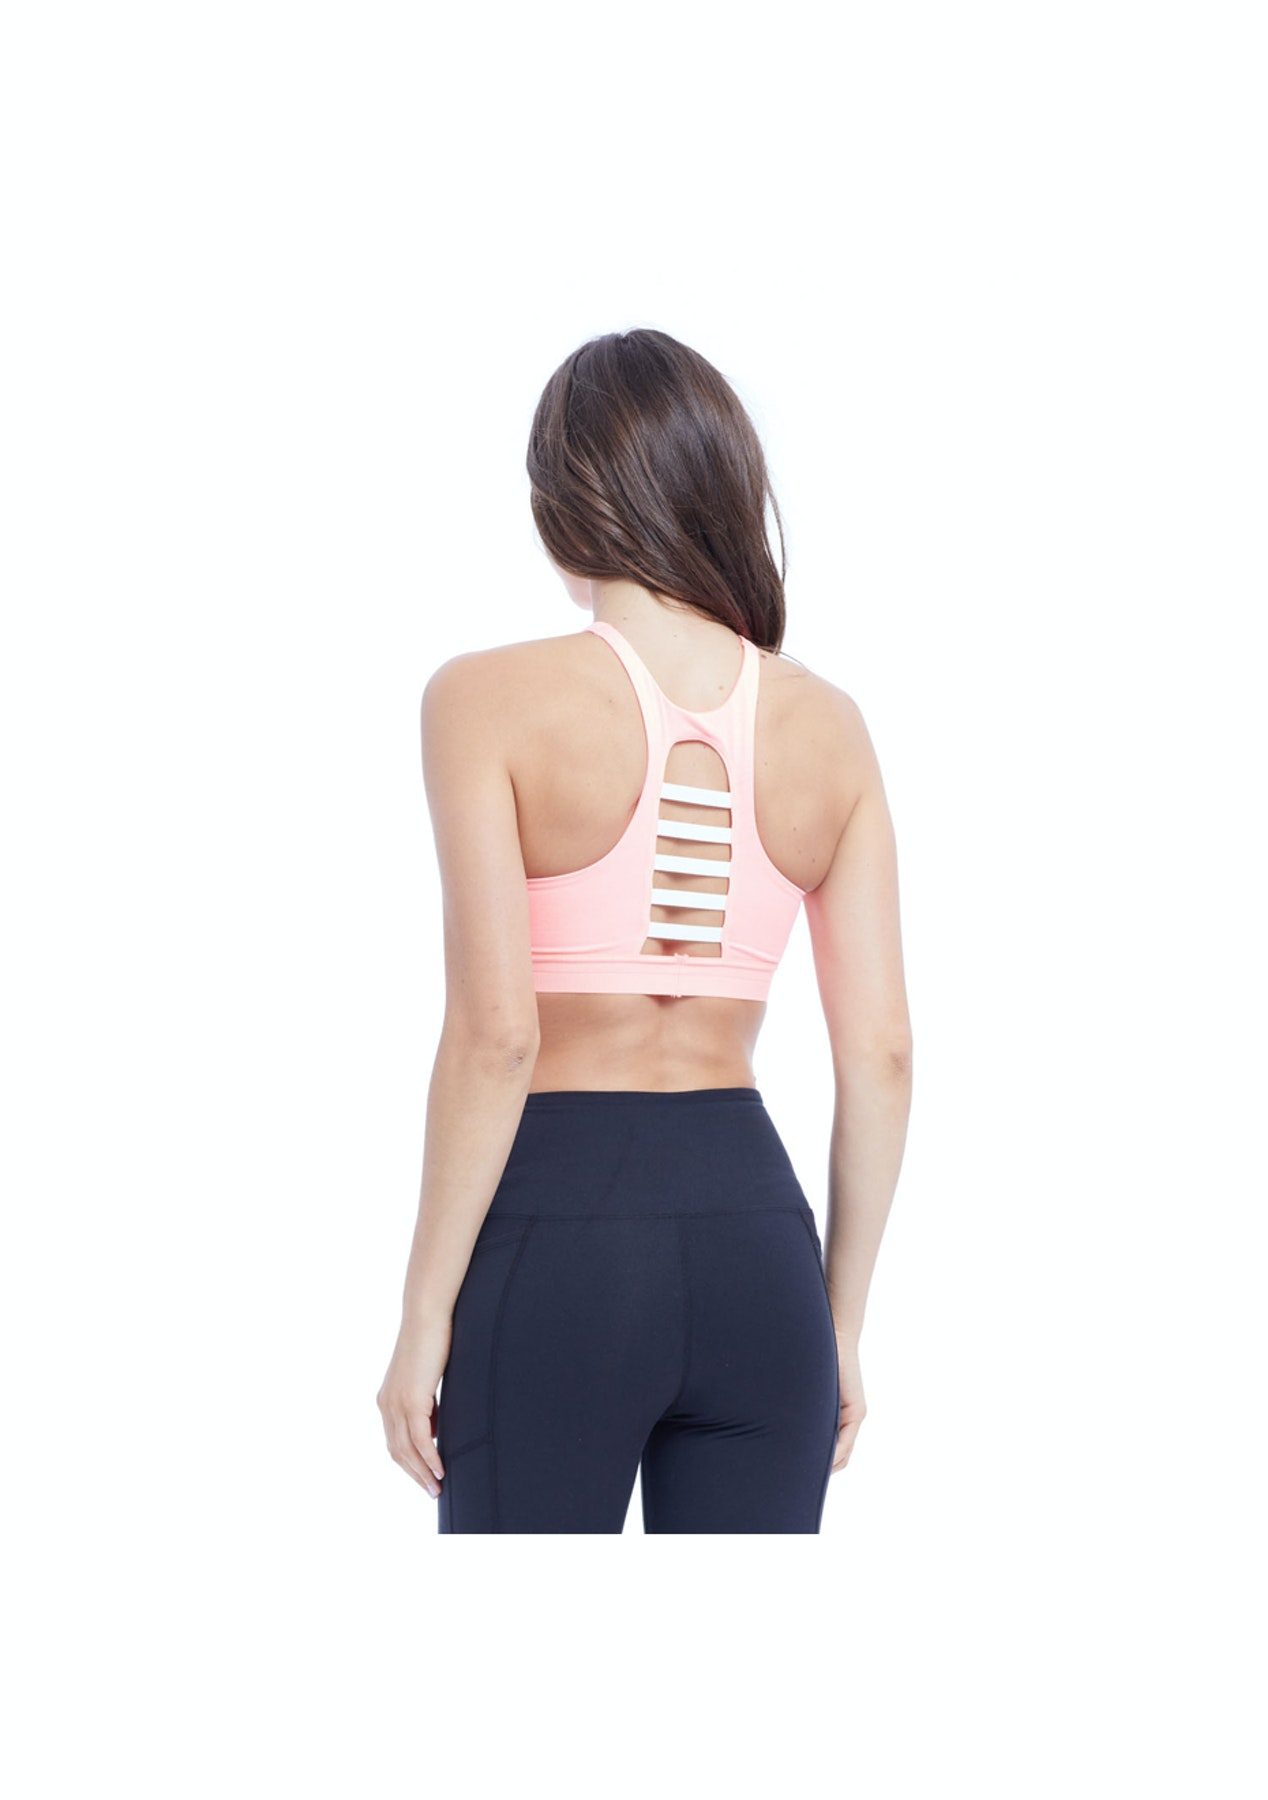 c2d6d59dea515 Marika Tek - Eva Sport Bra - Htr Coral Kiss - Marika Activewear Up To 63%  Off - Onceit